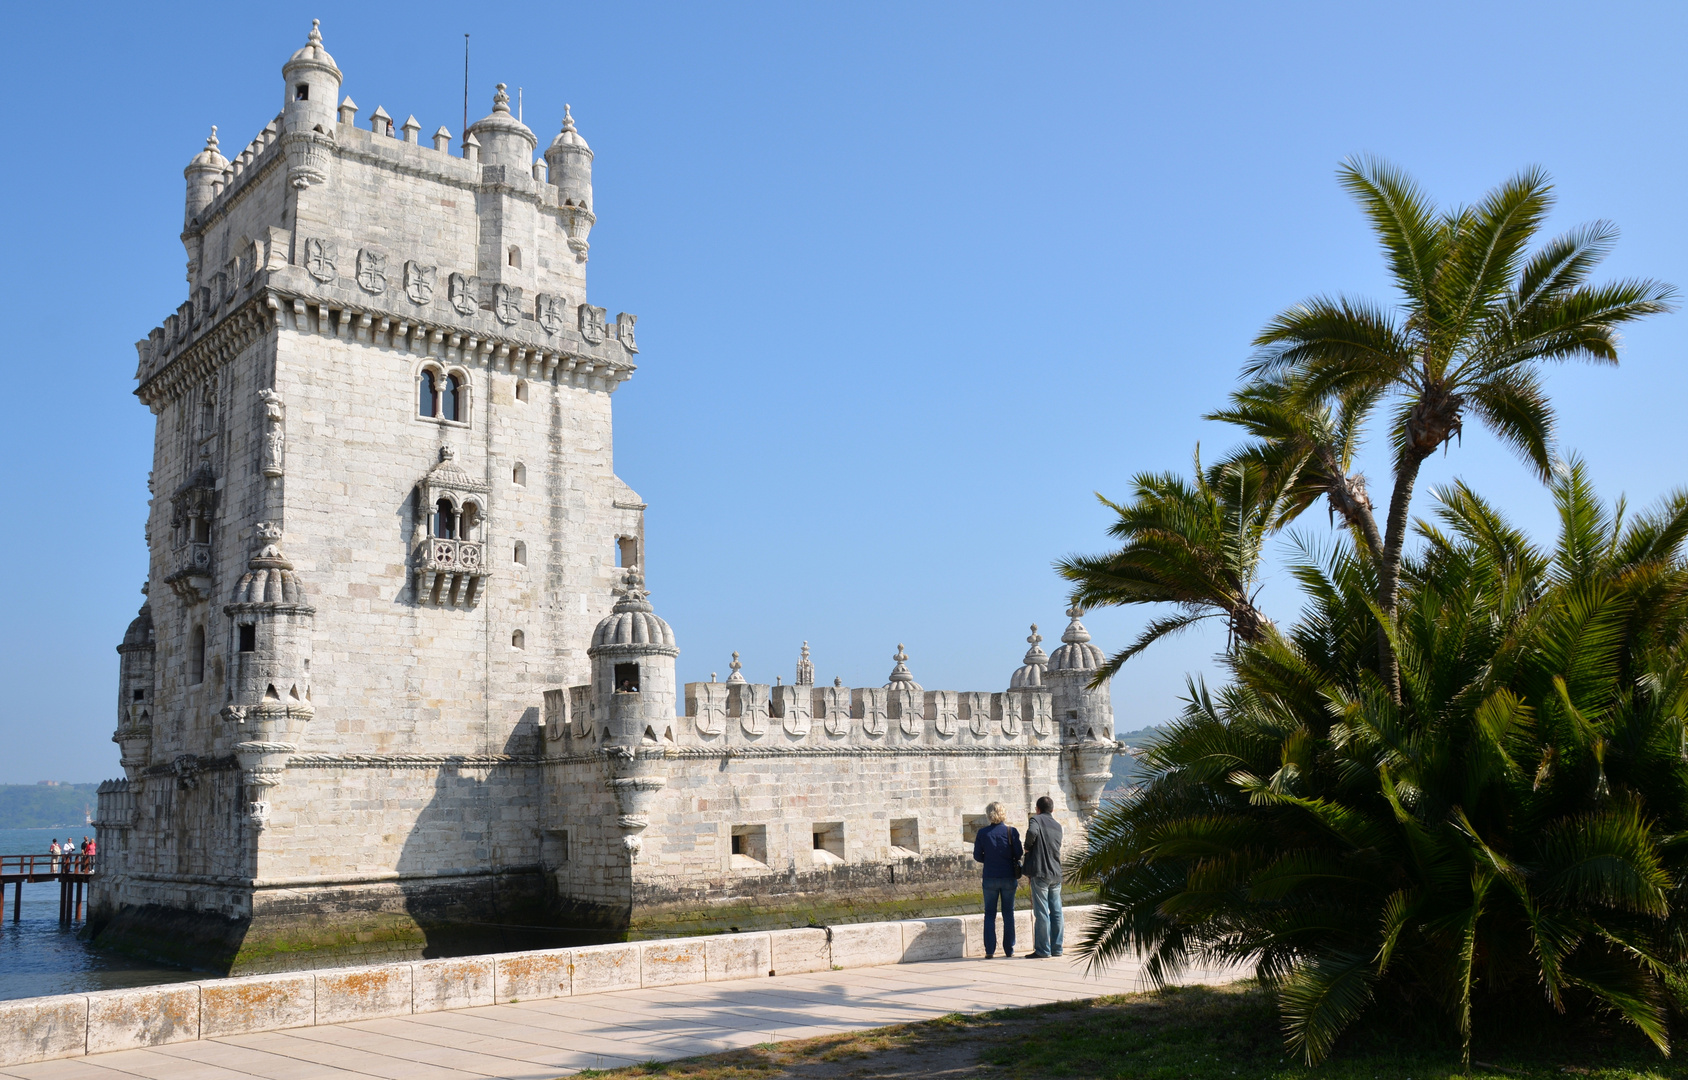 Turm von Belém